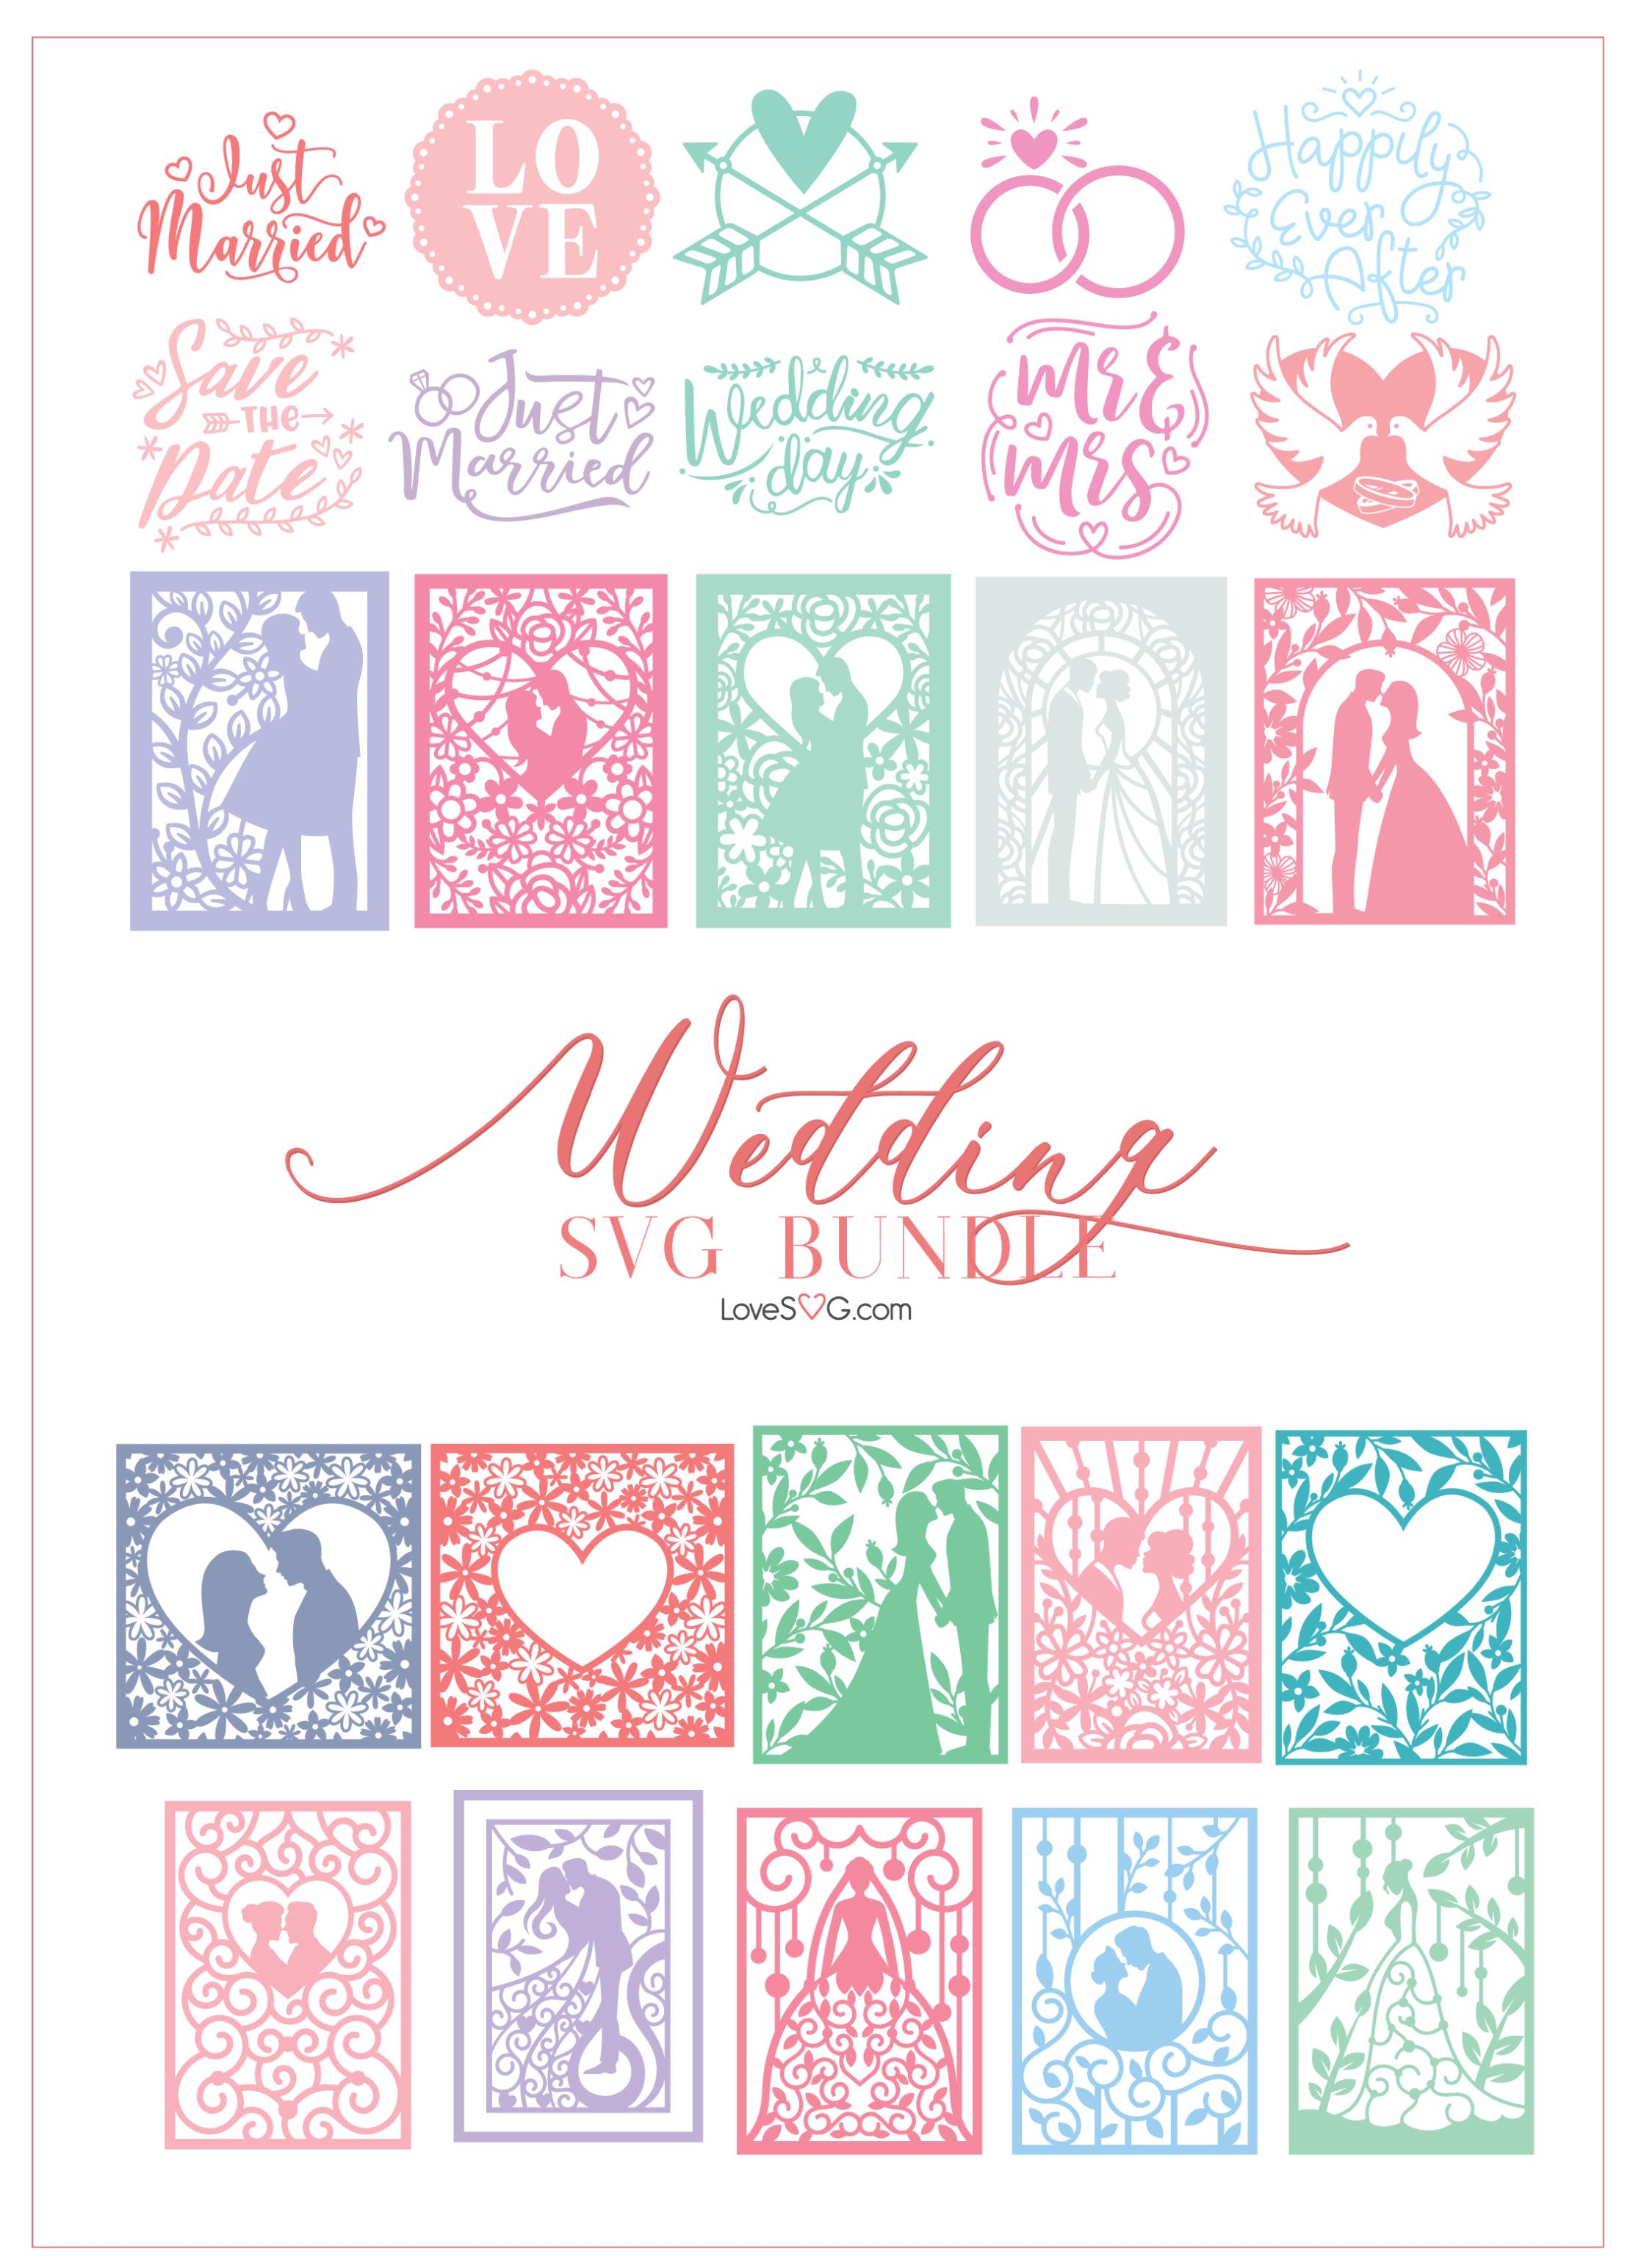 Download The Wedding SVG Bundle LoveSVG - Preview (4) | Cricut ...